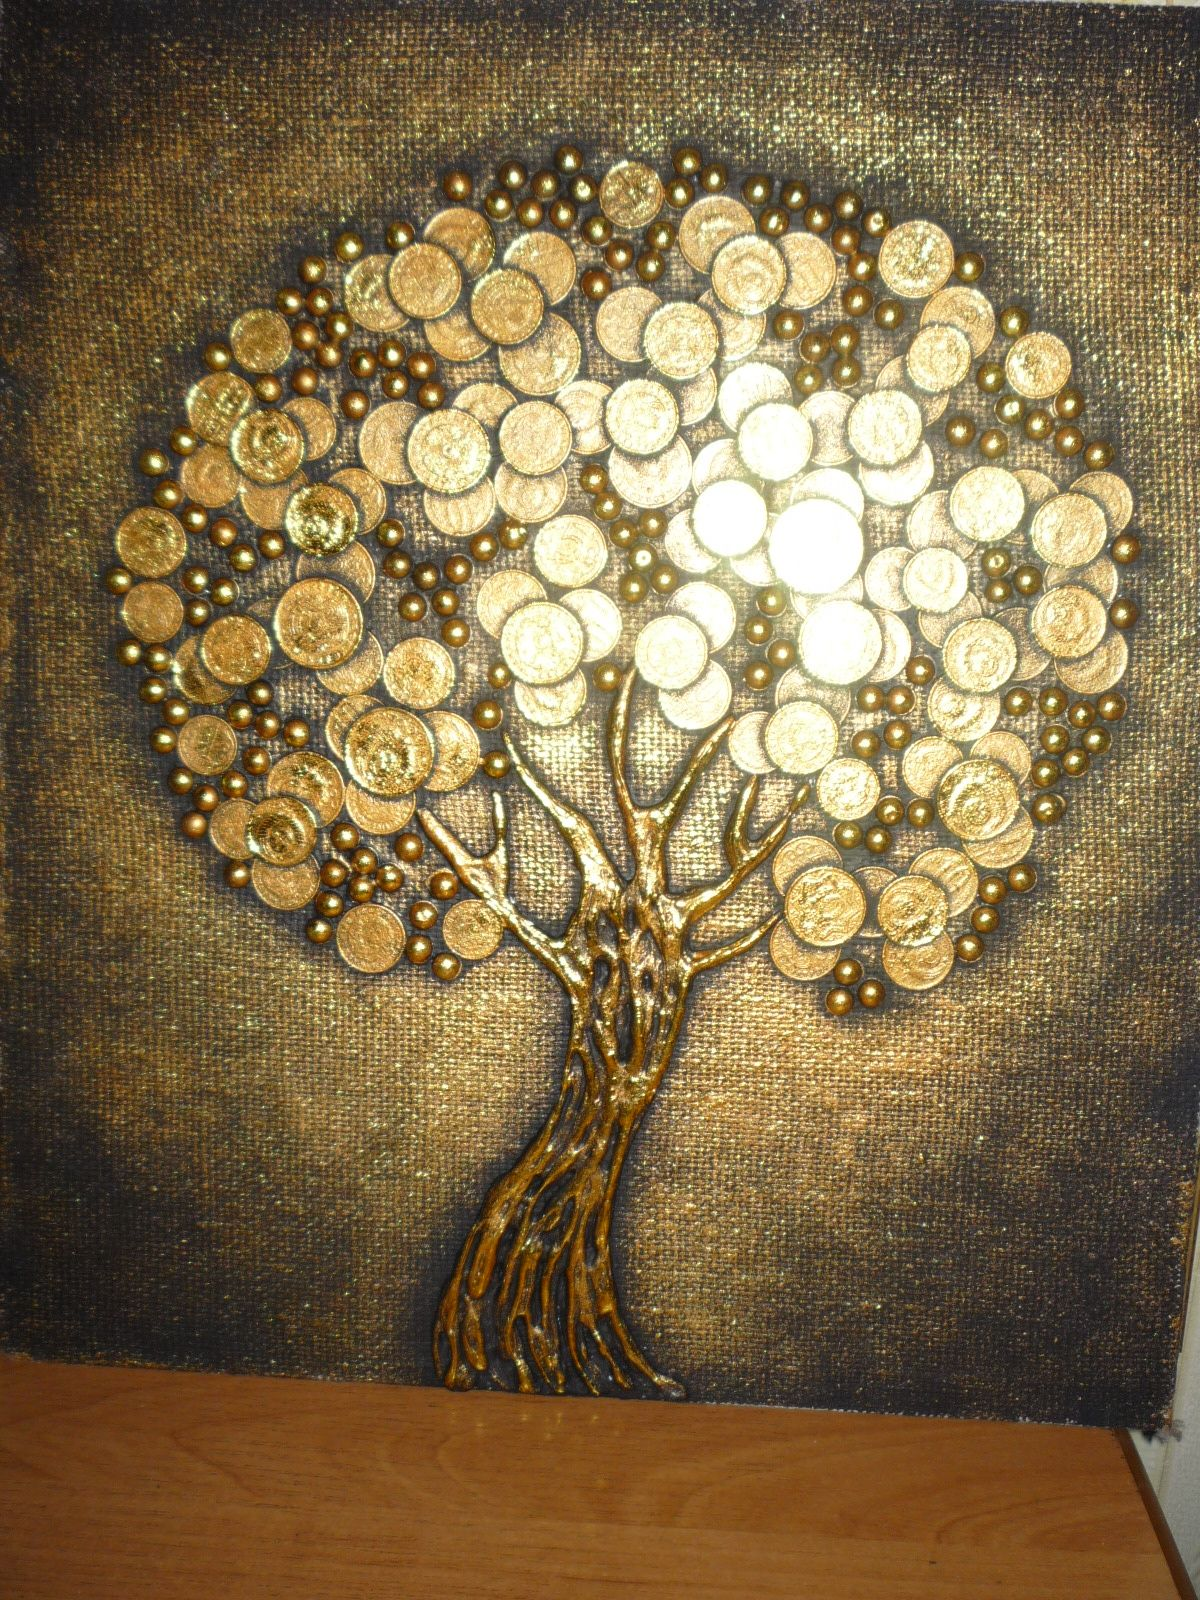 частности, картинки дерево с монетами годы